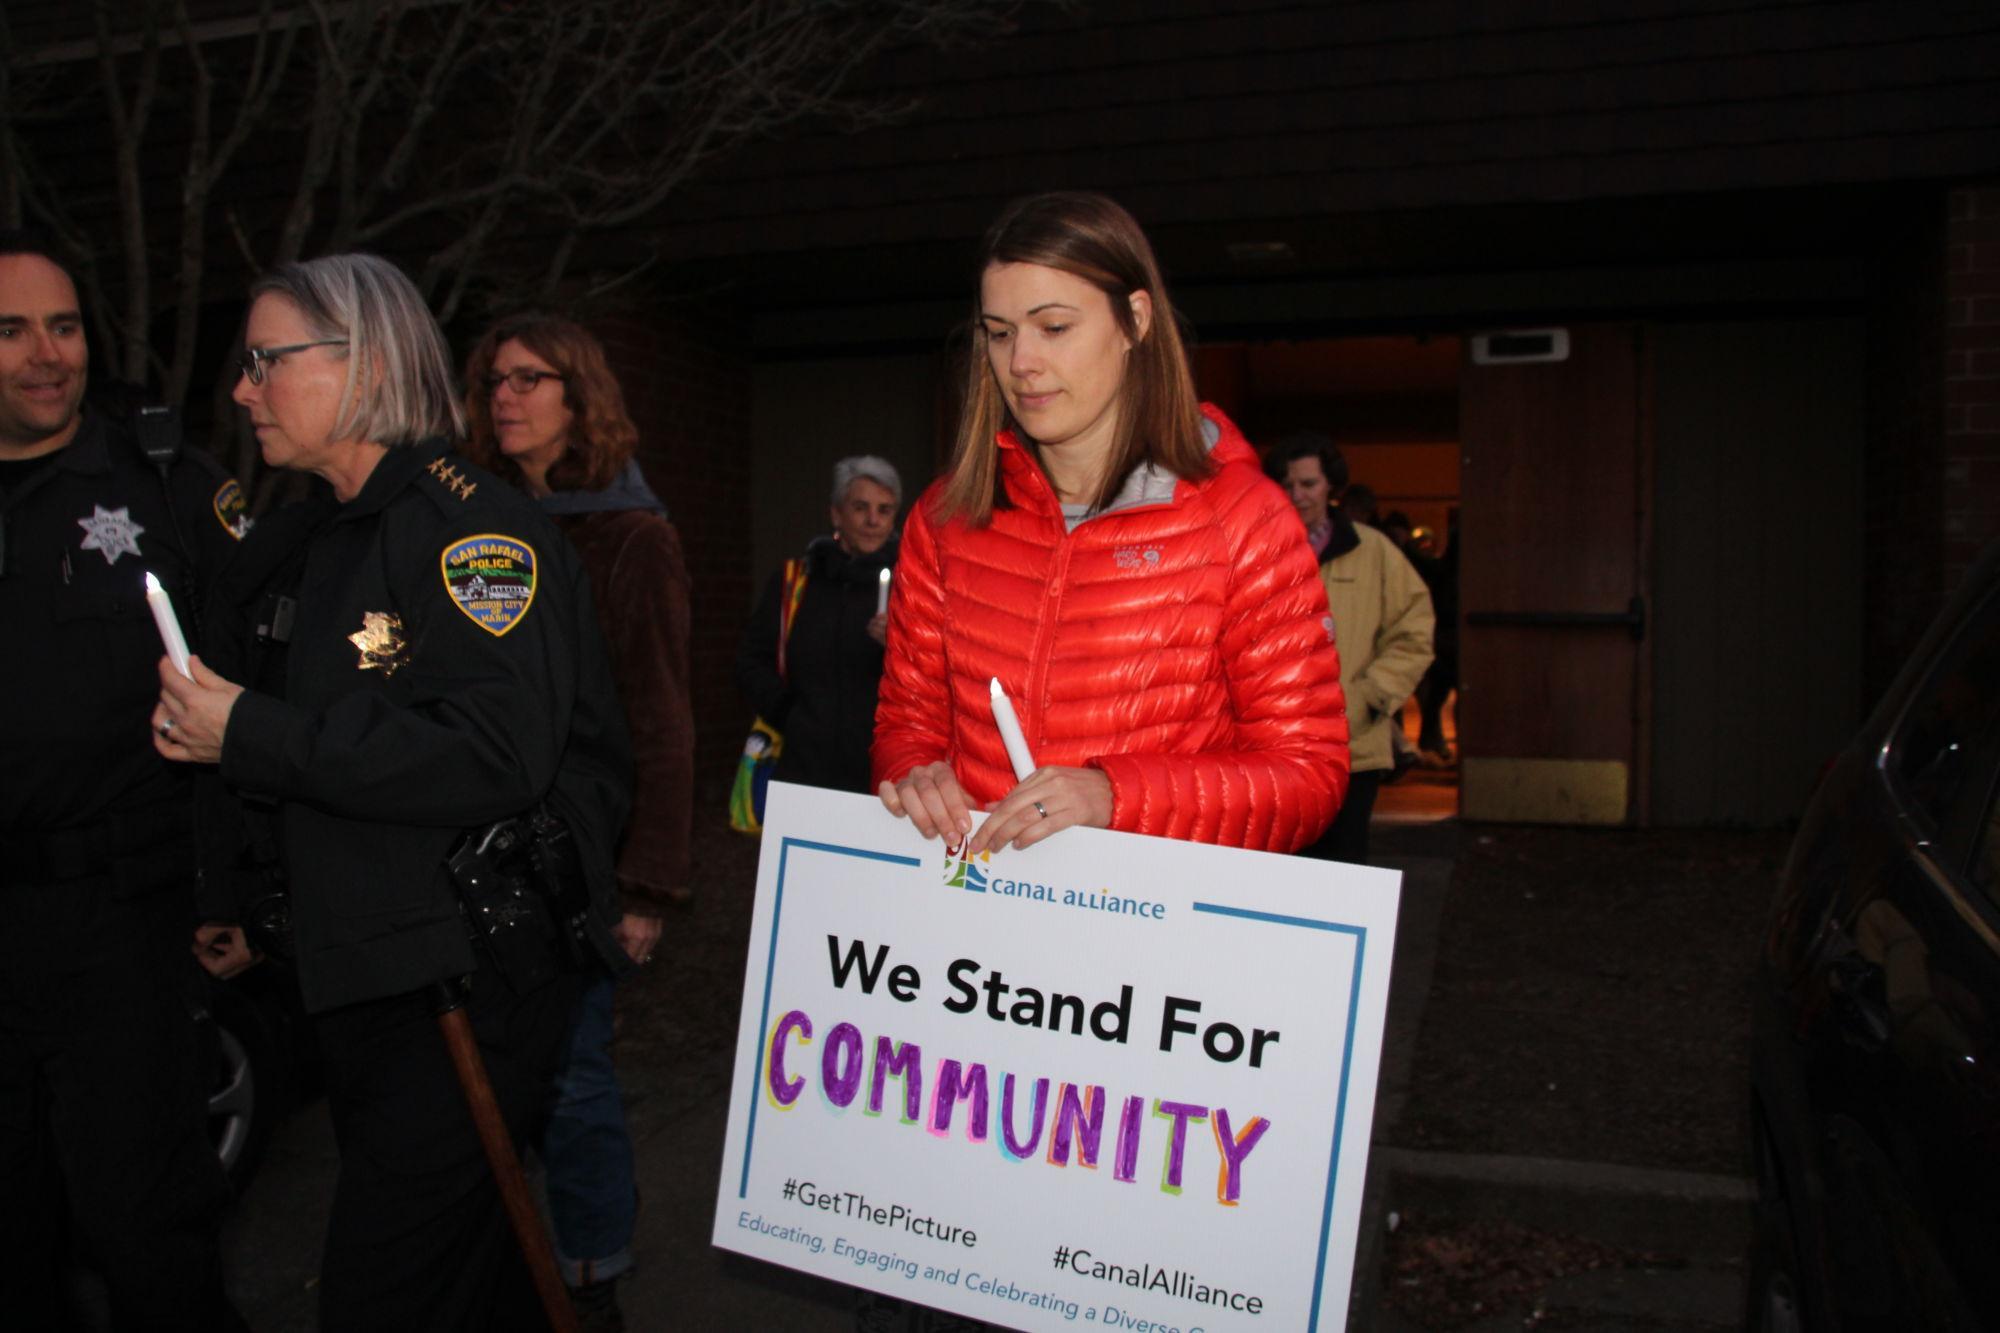 Valentine's Day community event celebrates diversity with candlelight walk